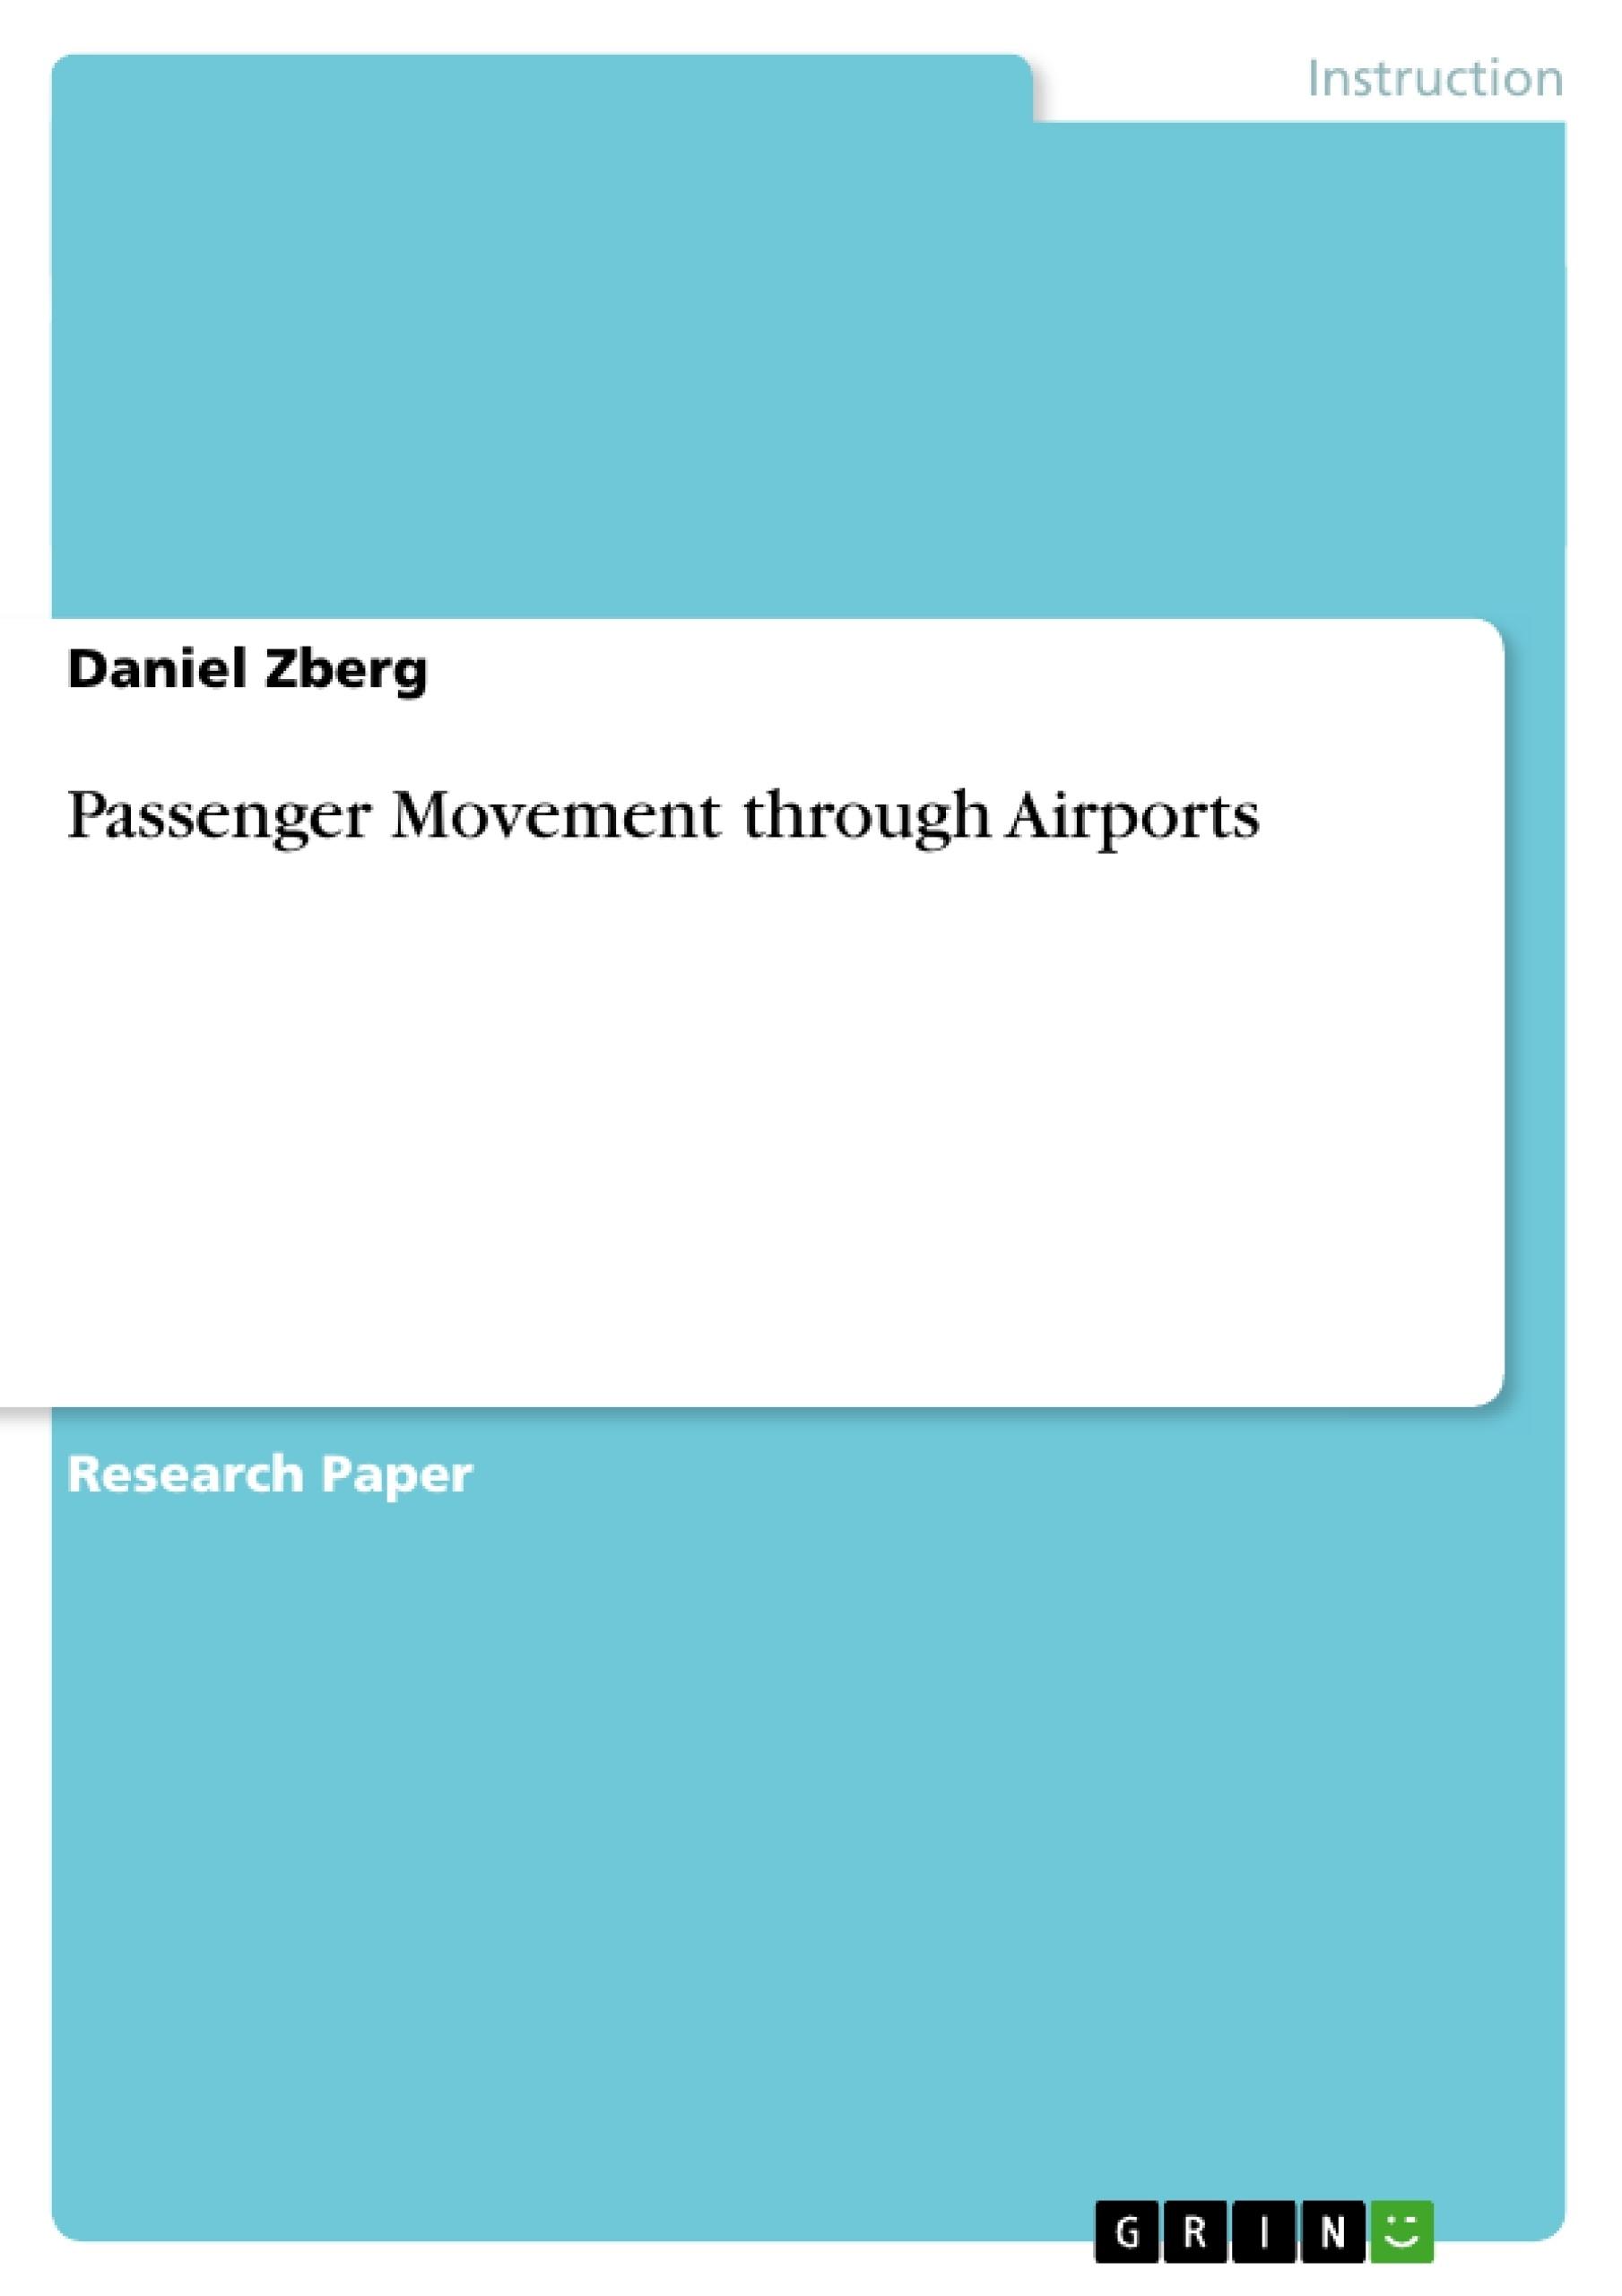 Title: Passenger Movement through Airports